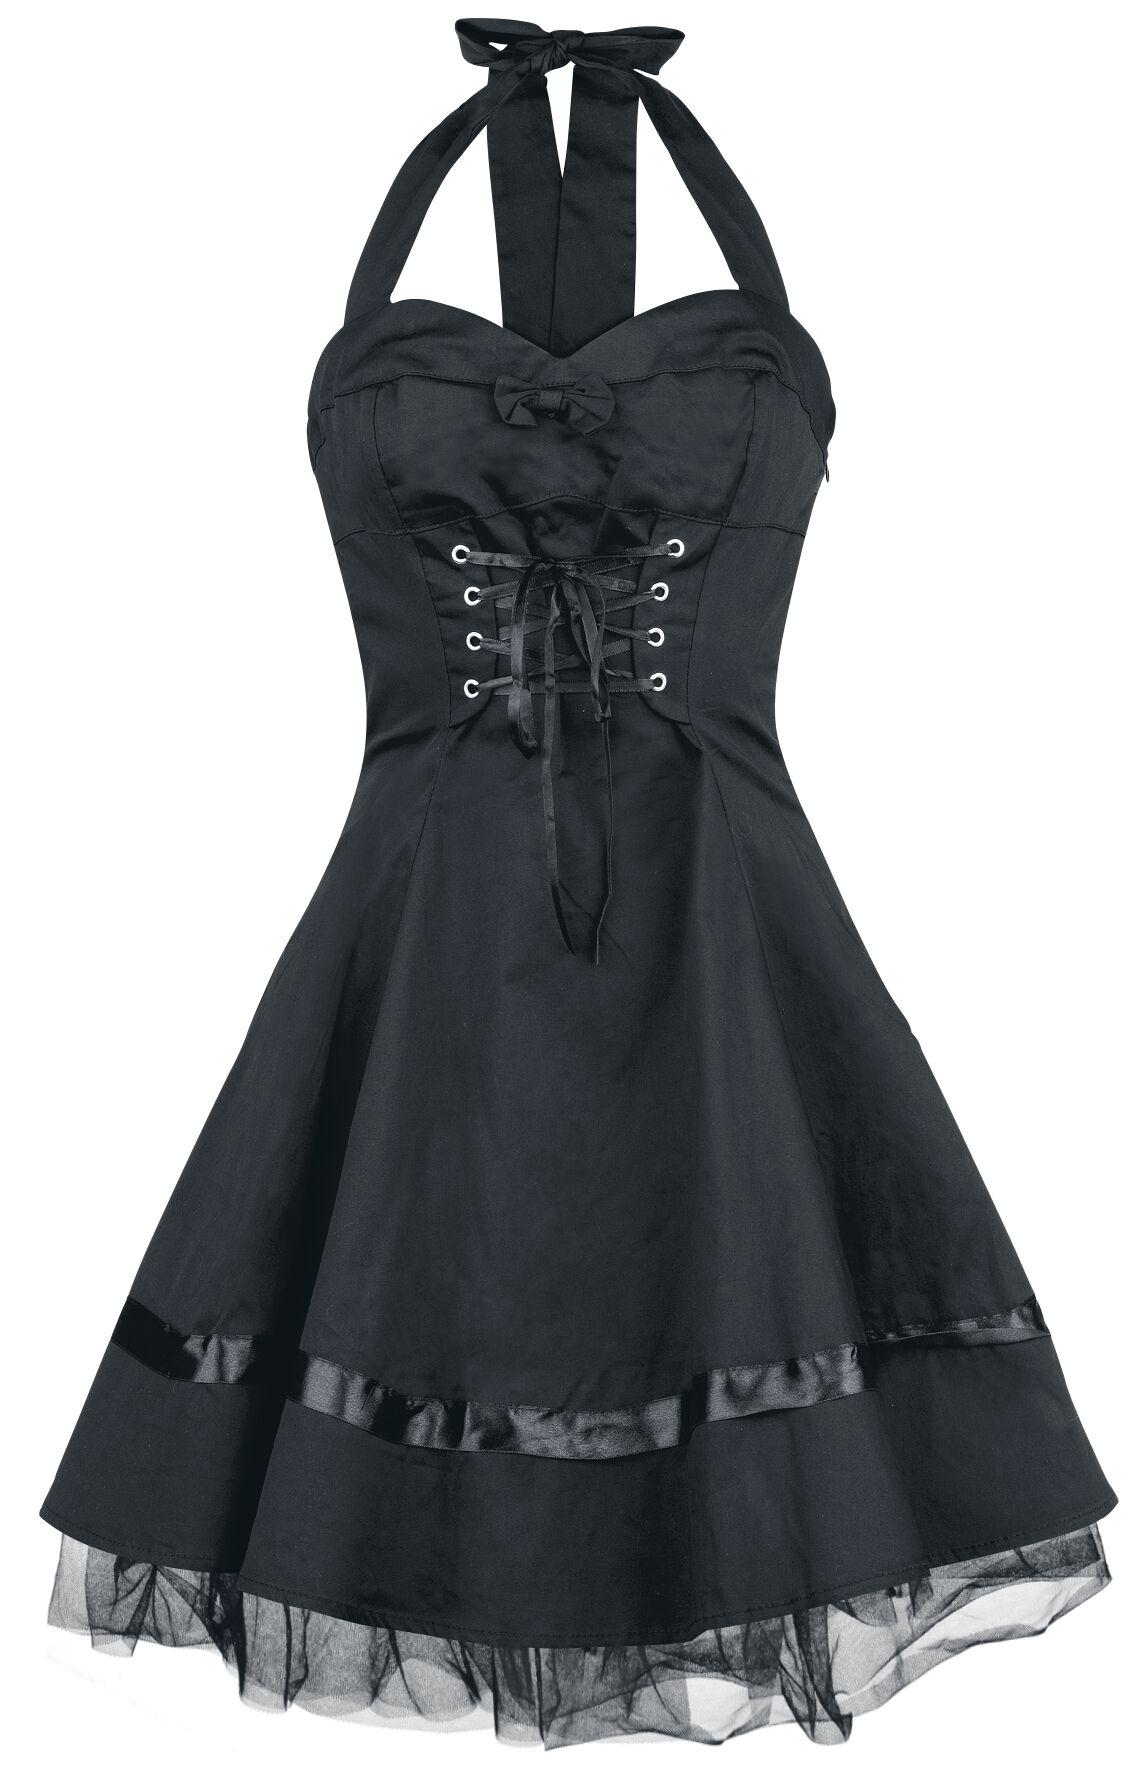 H&R London Lace Cotton Dress Sukienka czarny